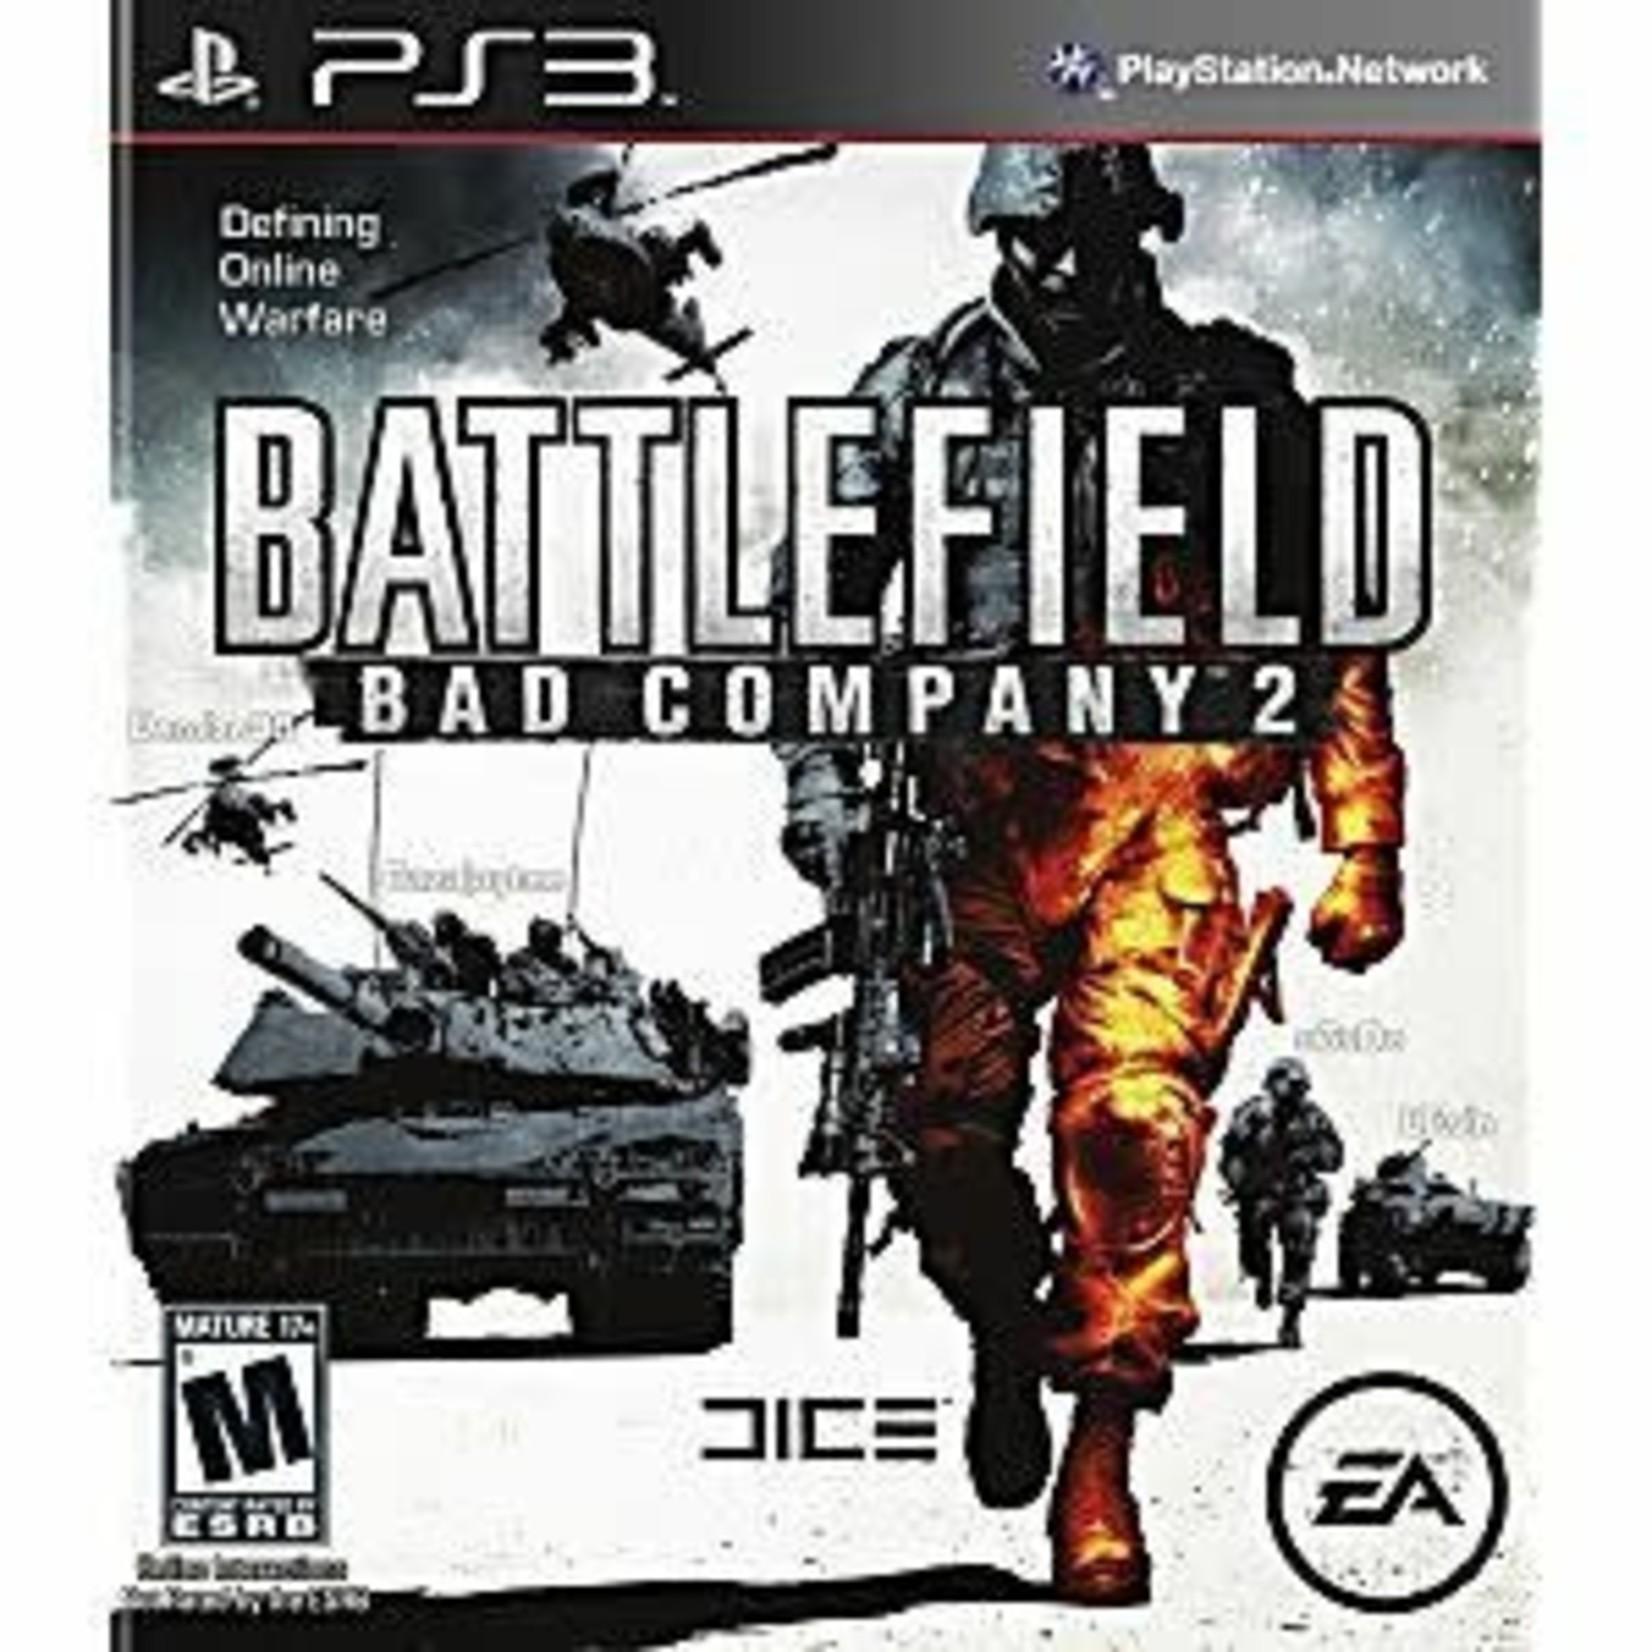 PS3U-Battlefield Bad Company 2